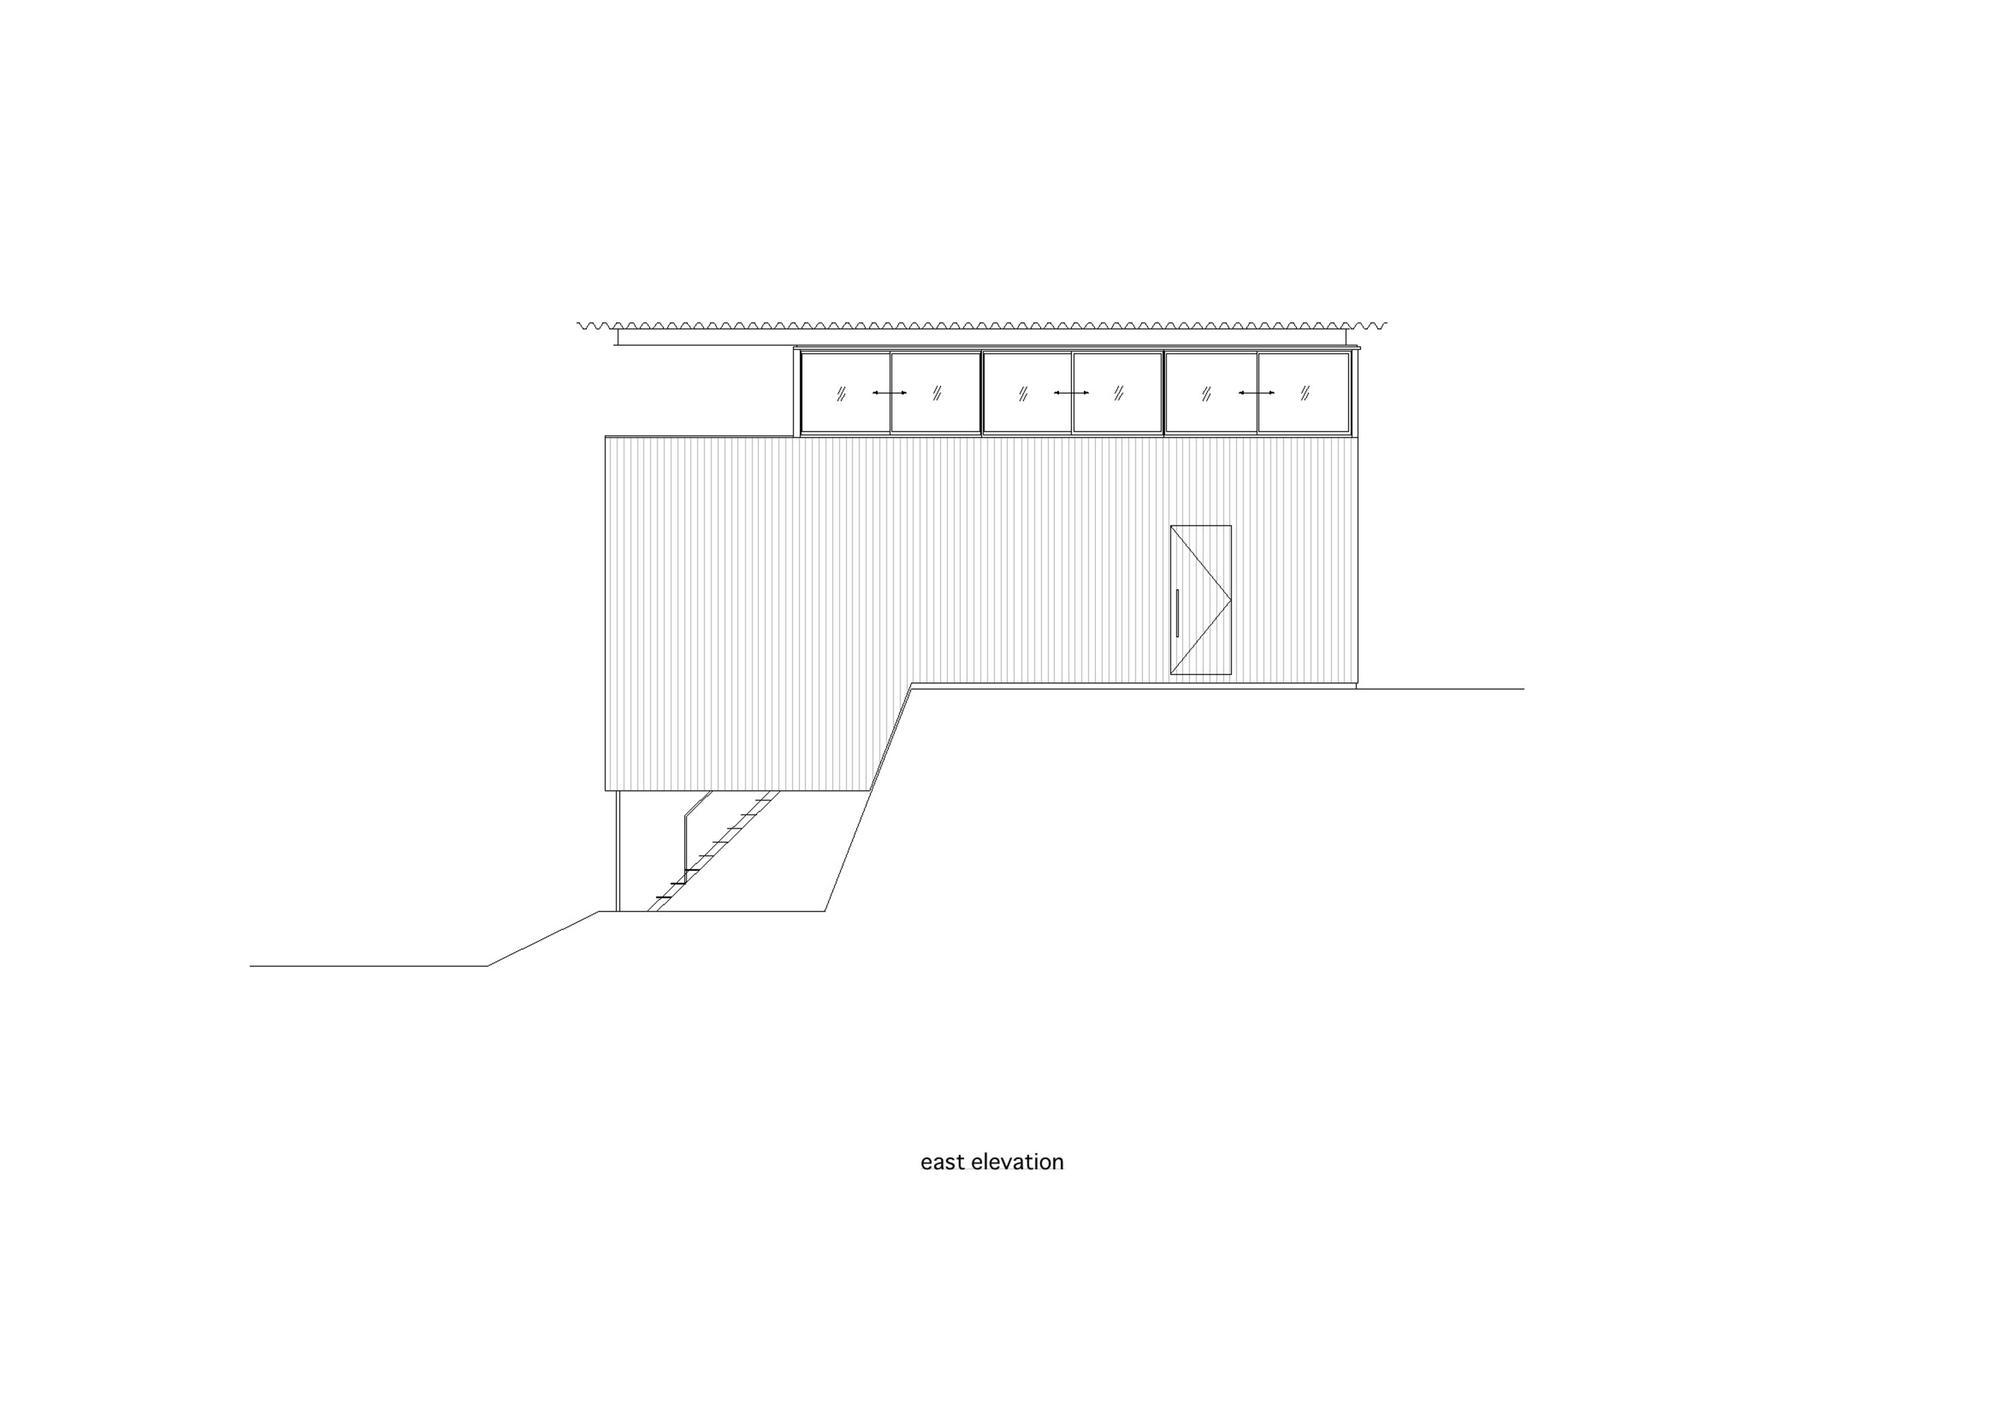 540ea143c07a808f0a000155_house-in-miyake-hidetaka-nakahara-architects-yoshio-ohno-architects_east_elevation